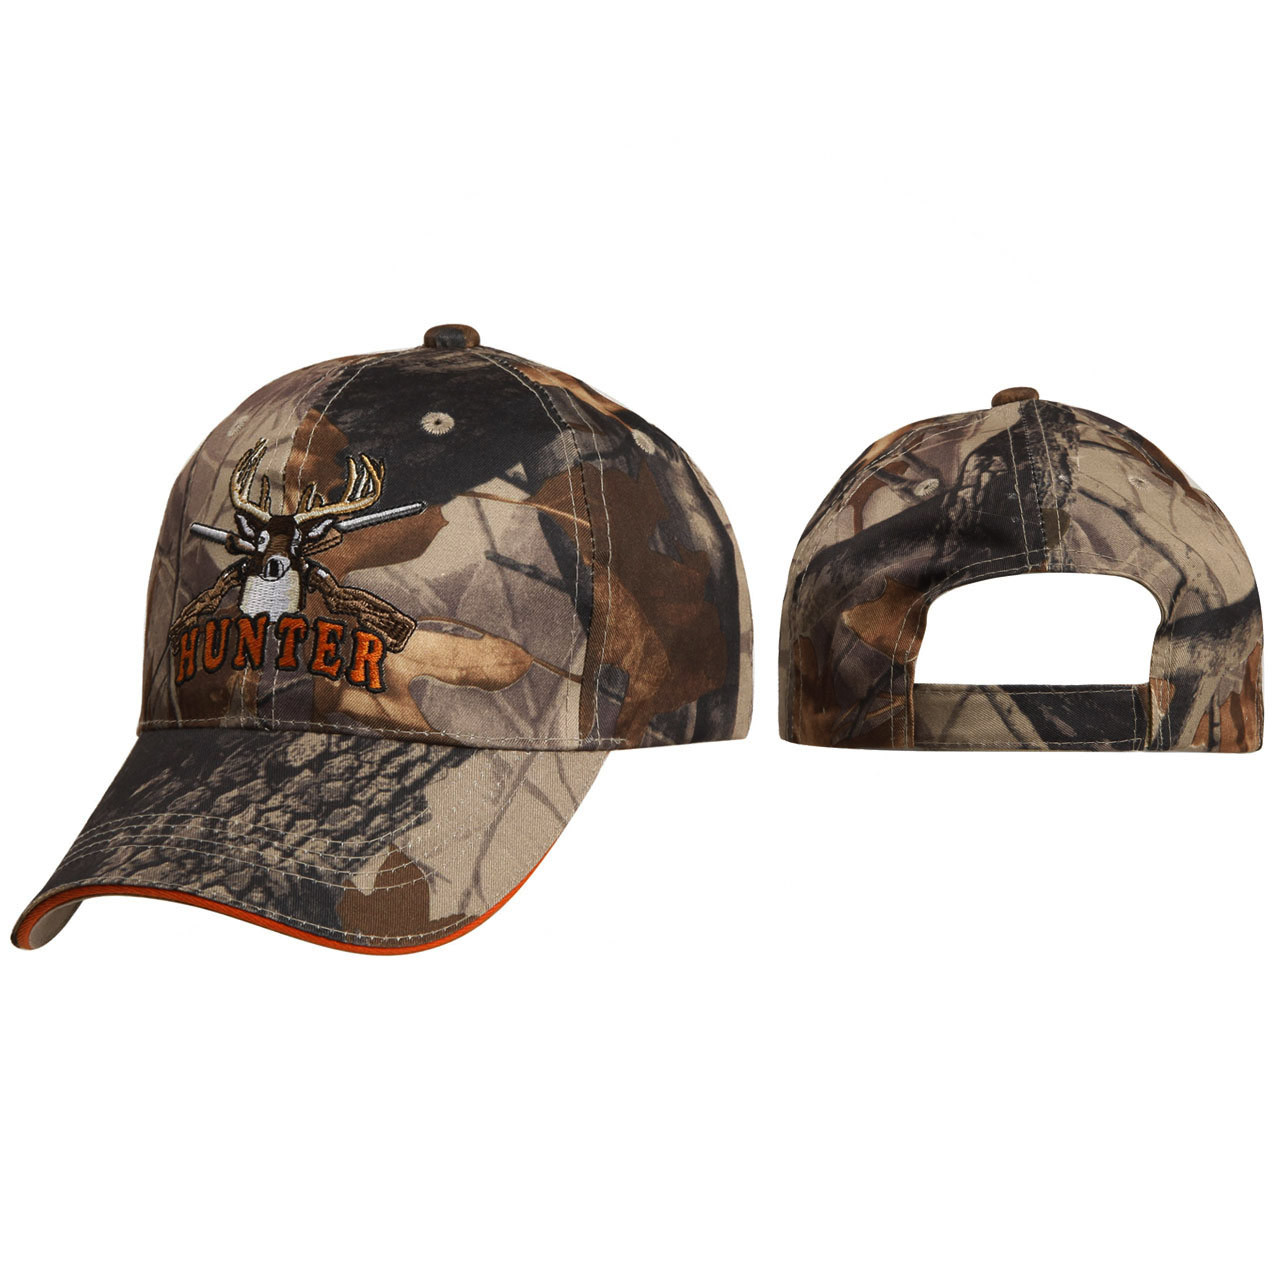 Wholesale Hunter's Cap